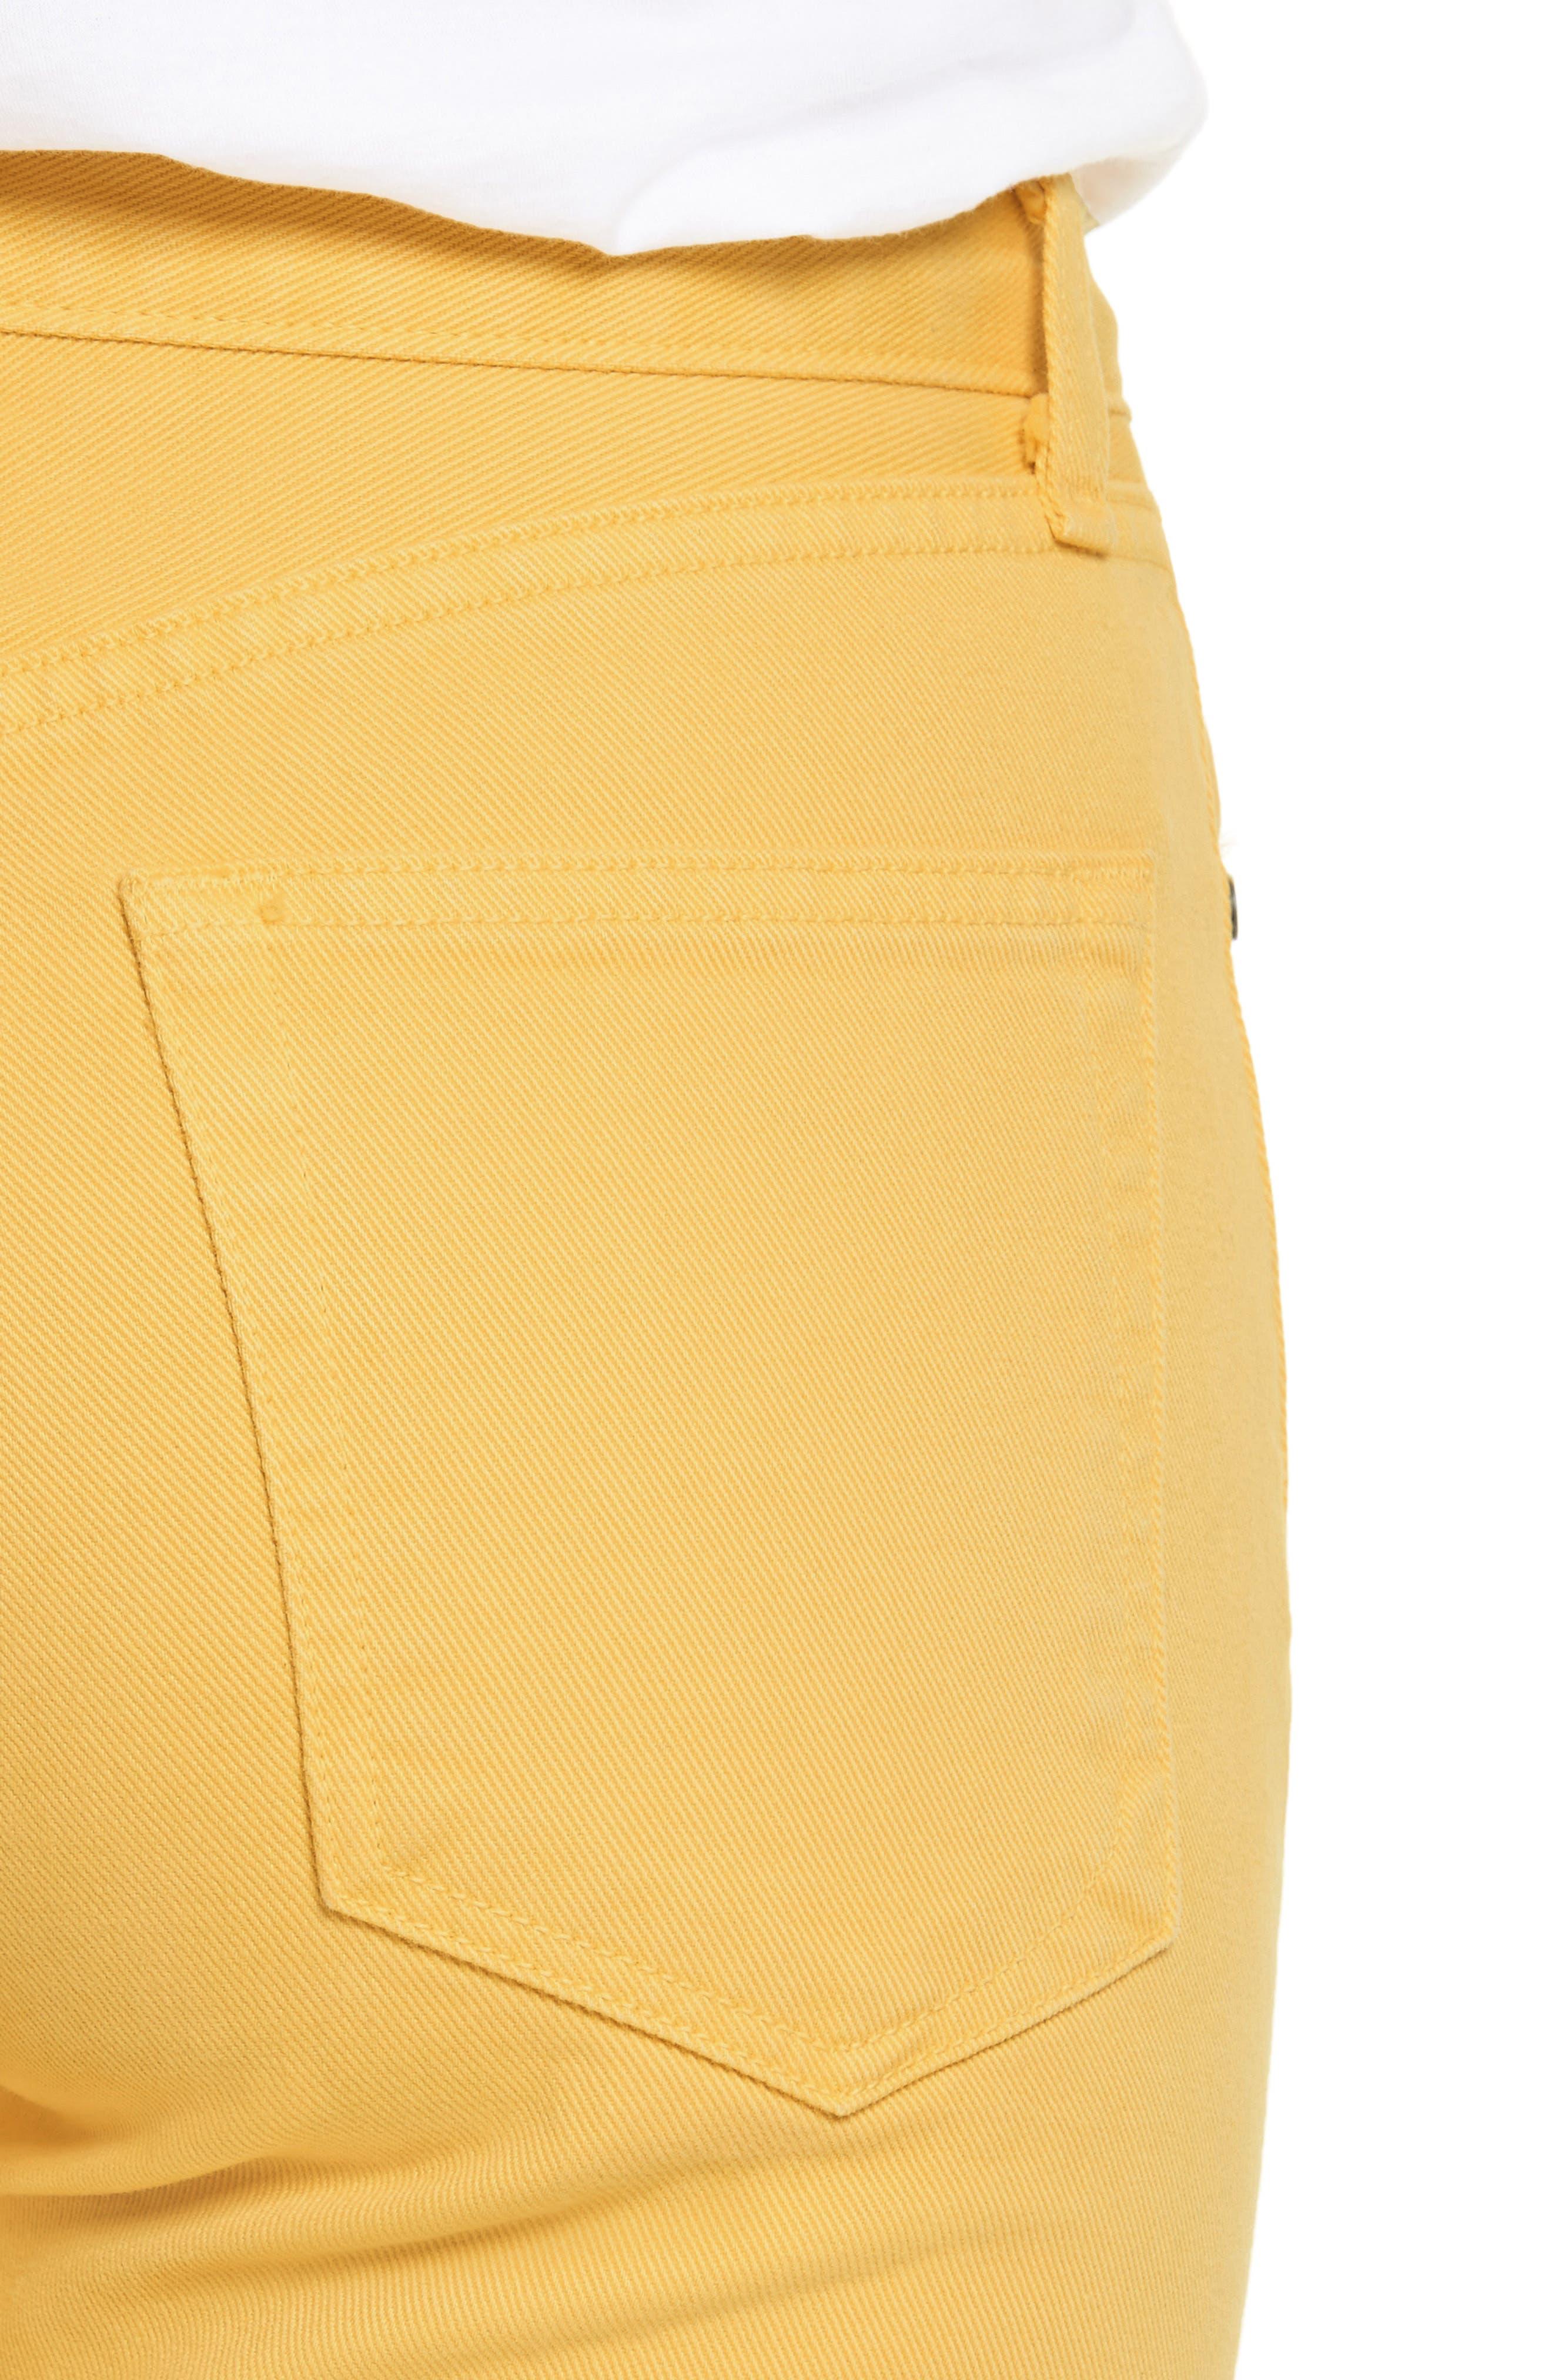 Straight Leg Crop Jeans,                             Alternate thumbnail 4, color,                             730